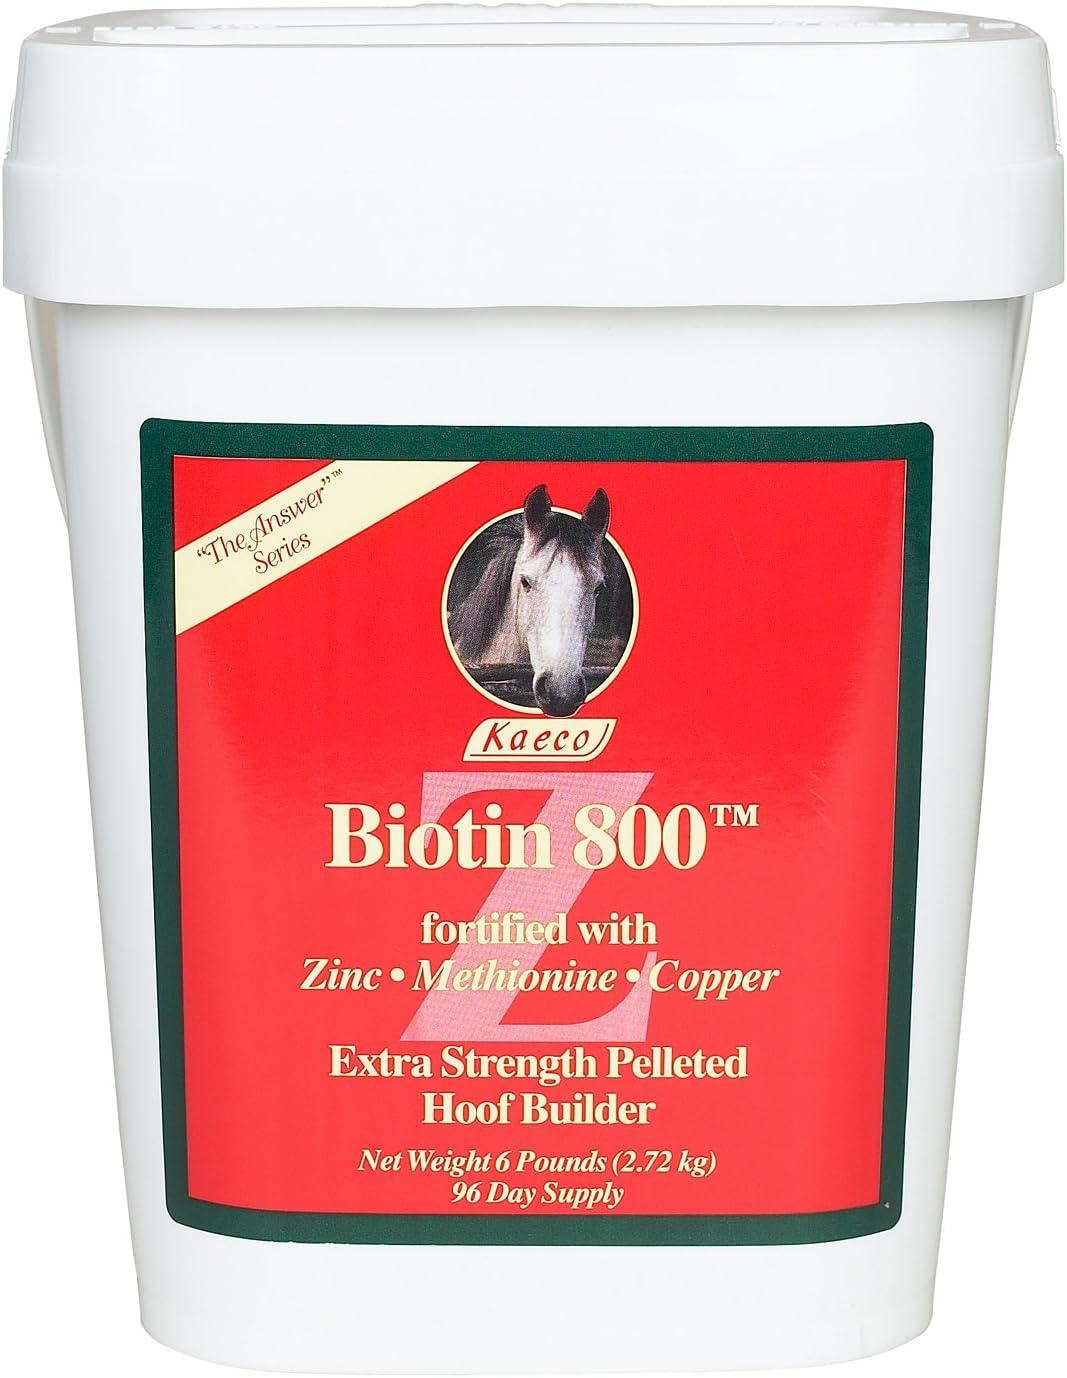 List price Max 45% OFF Biotin 800 Z 6lbs -